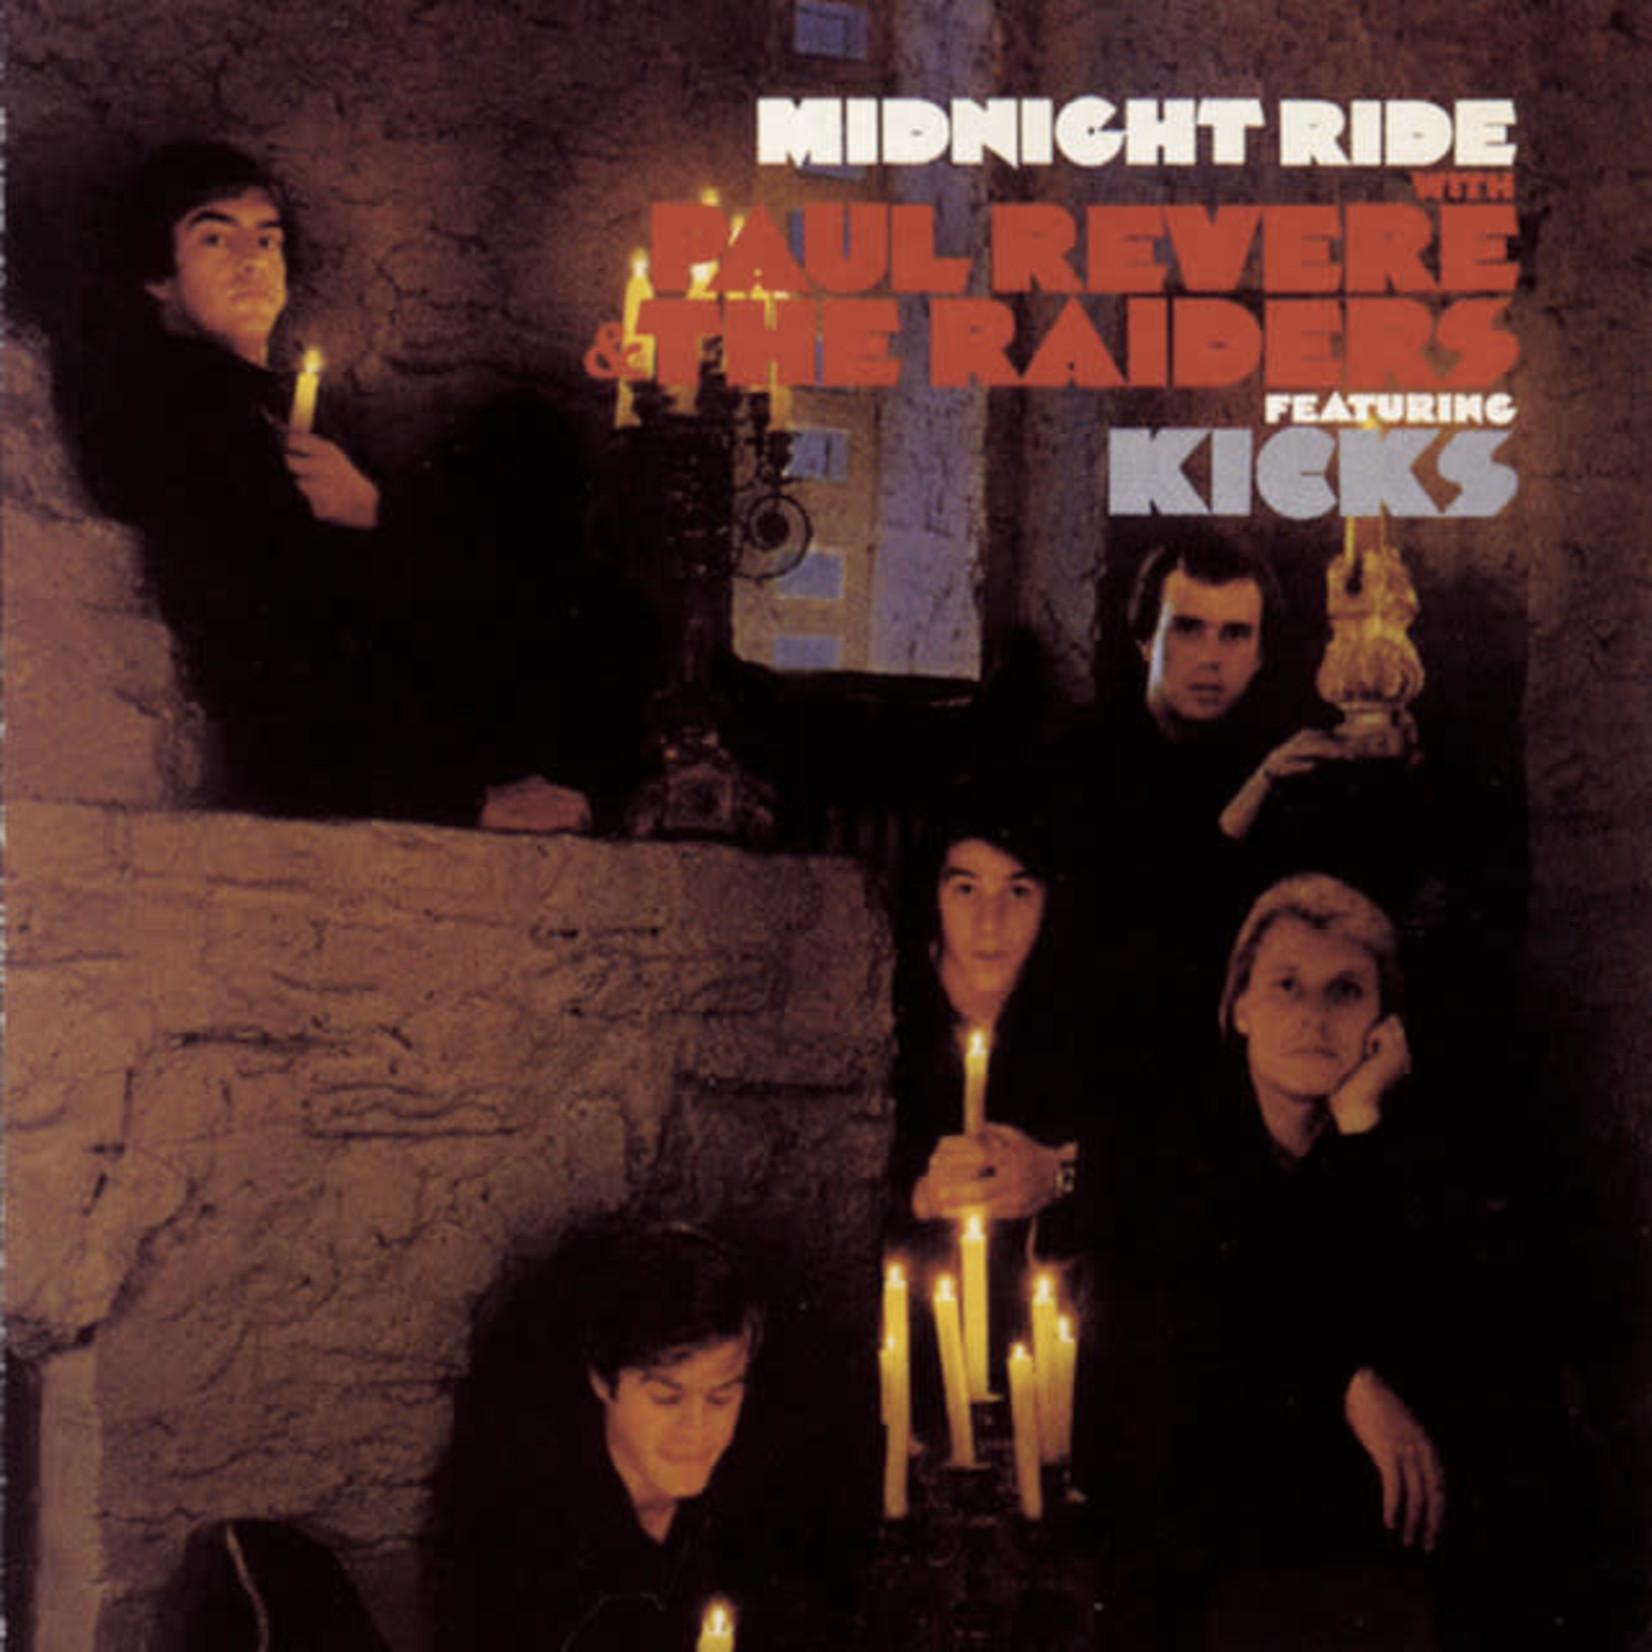 Vinyl Paul Revere & The Midnight Raiders - Midnight Ride